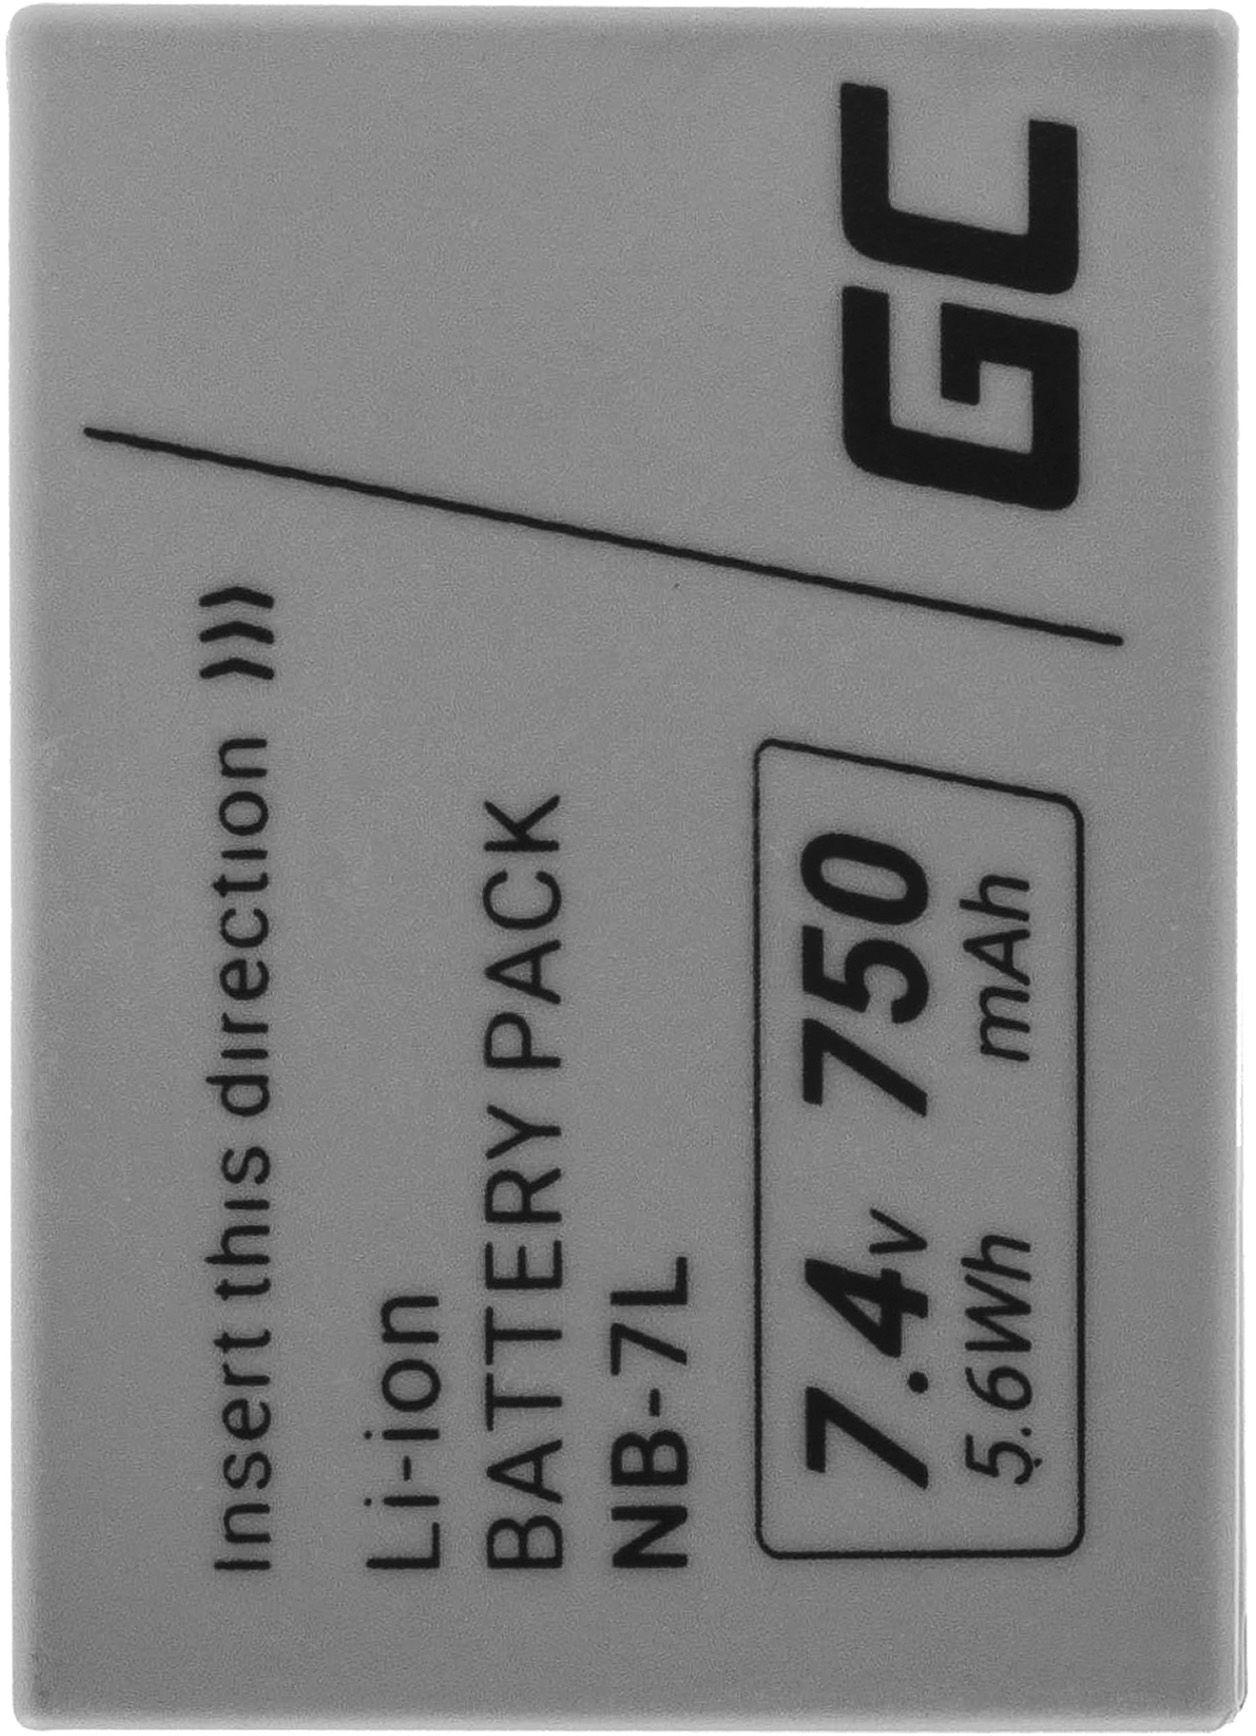 Akumulator Bateria Green Cell  NB-7L NB7L do Canon PowerShot SX30 IS G10 G11 G12, Full Decoded, 7.4V 750mAh